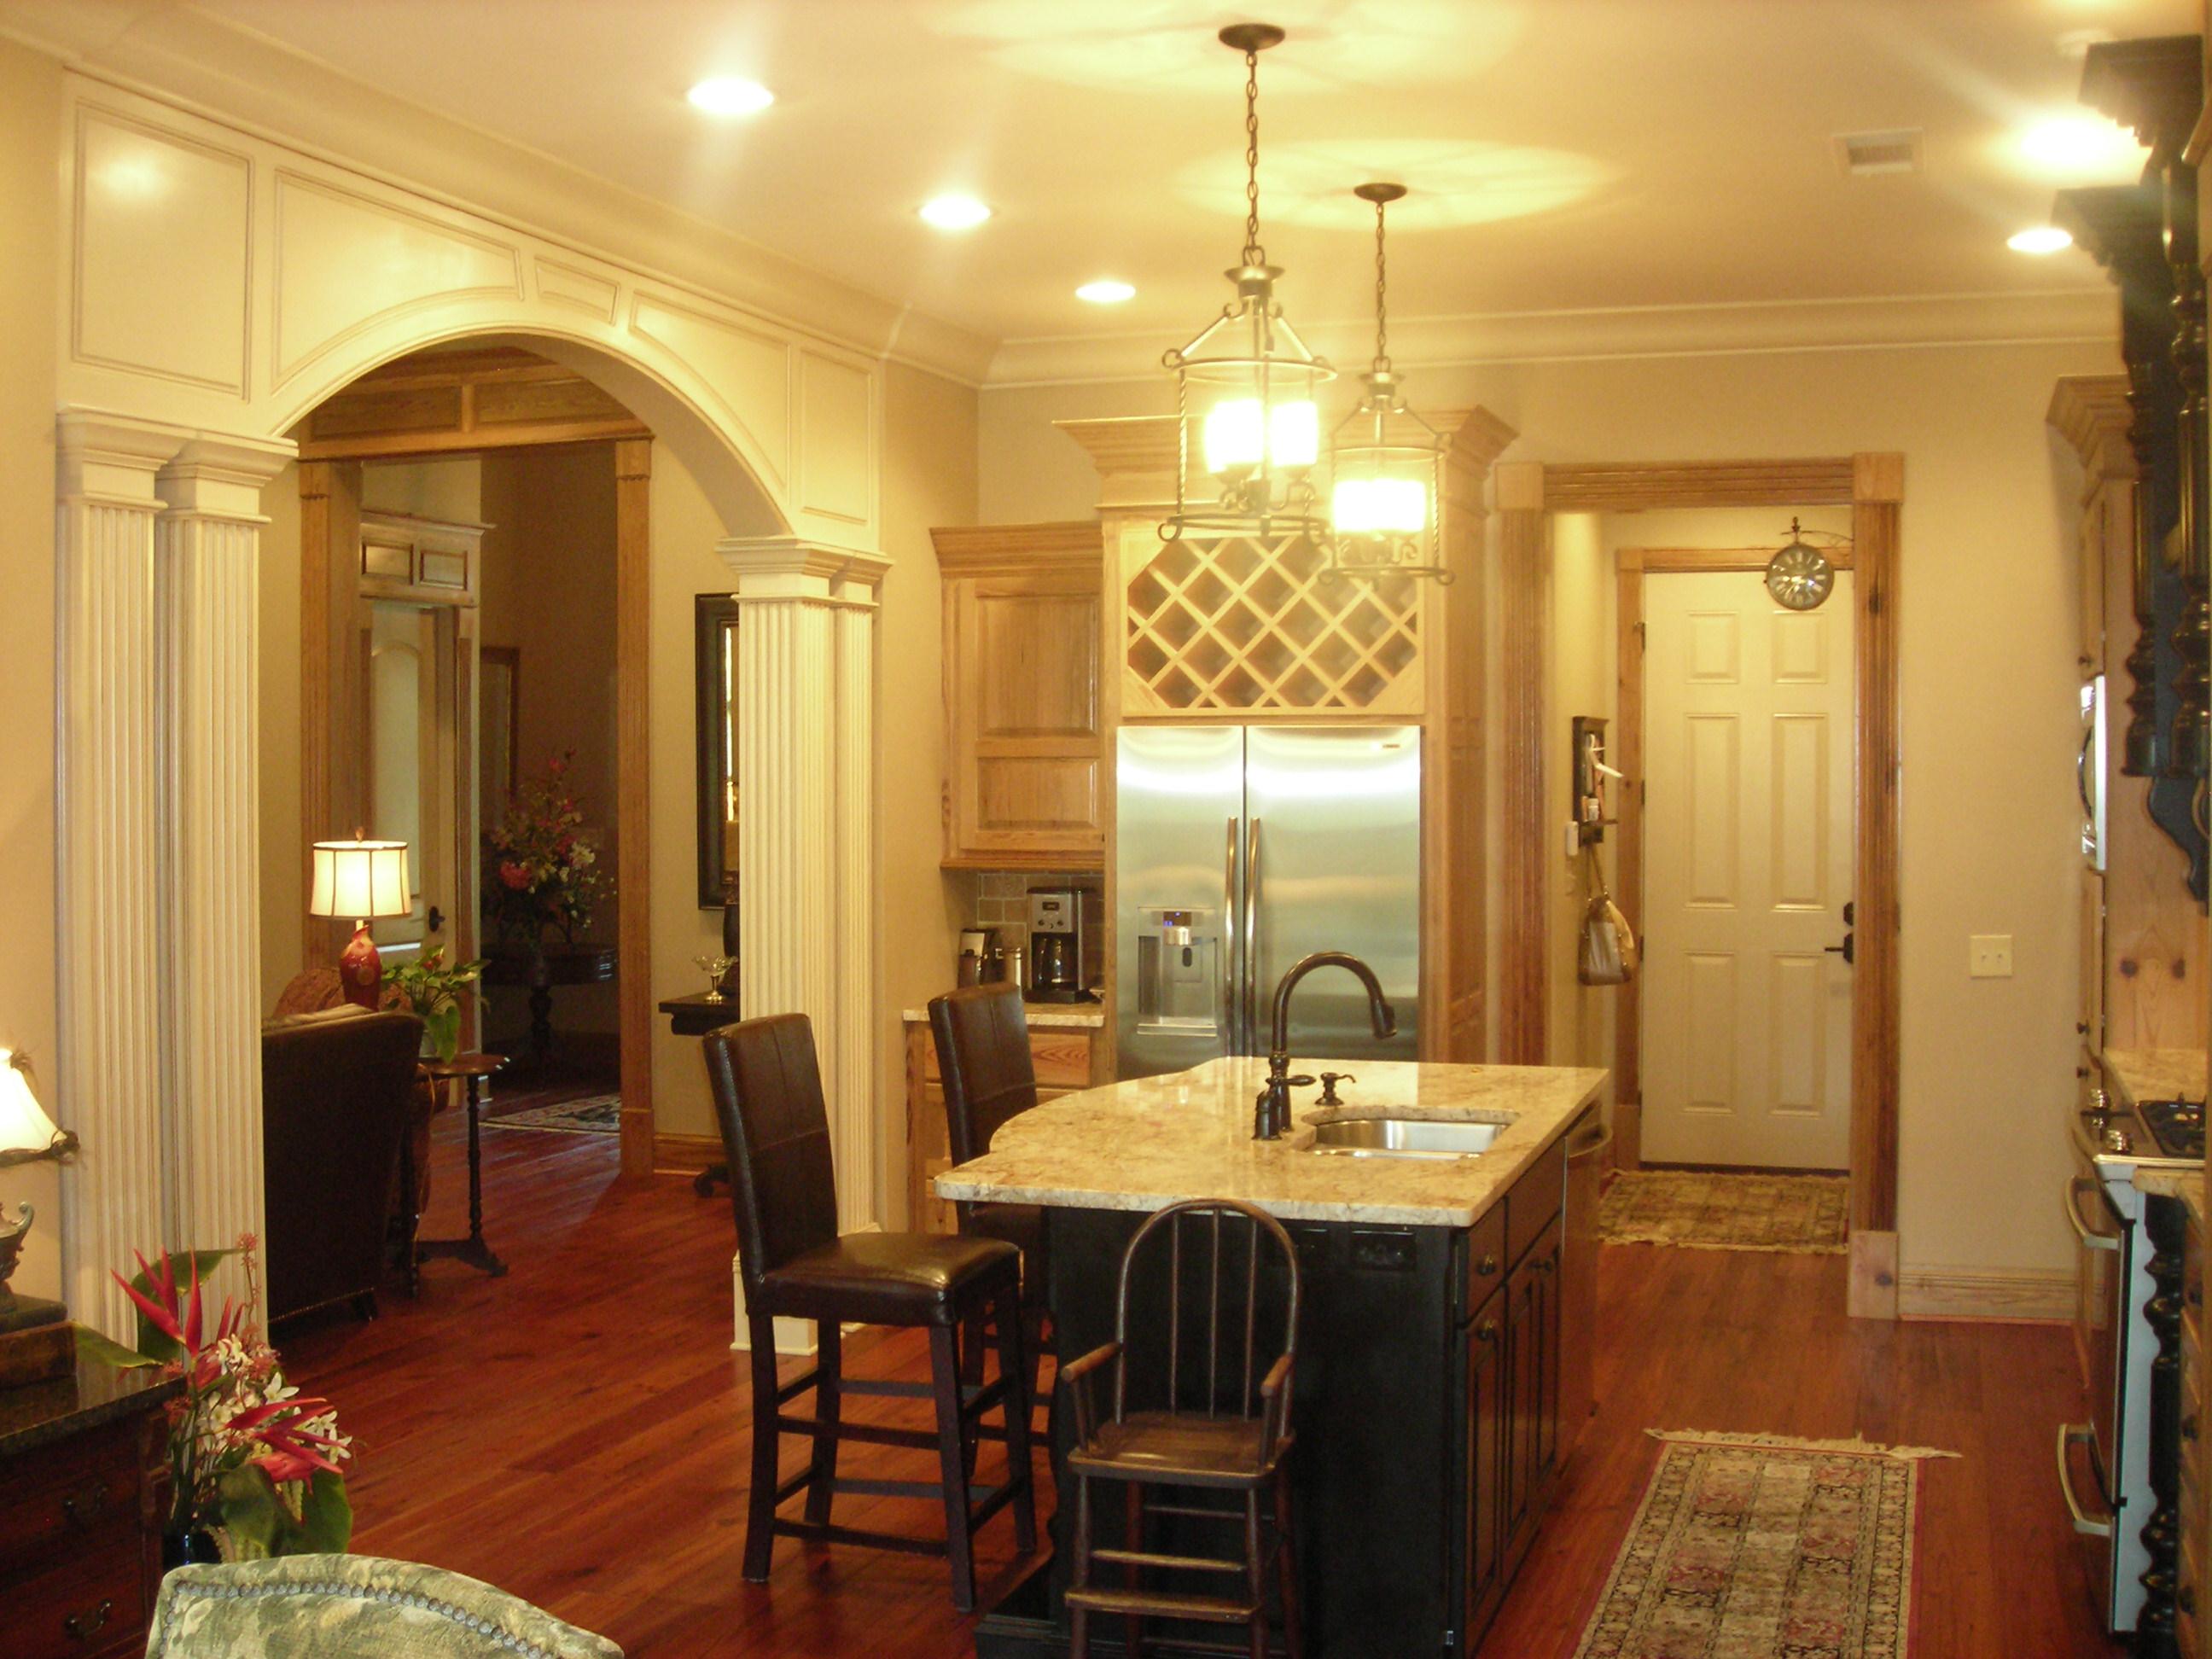 Bedrm Craftsman House Plan